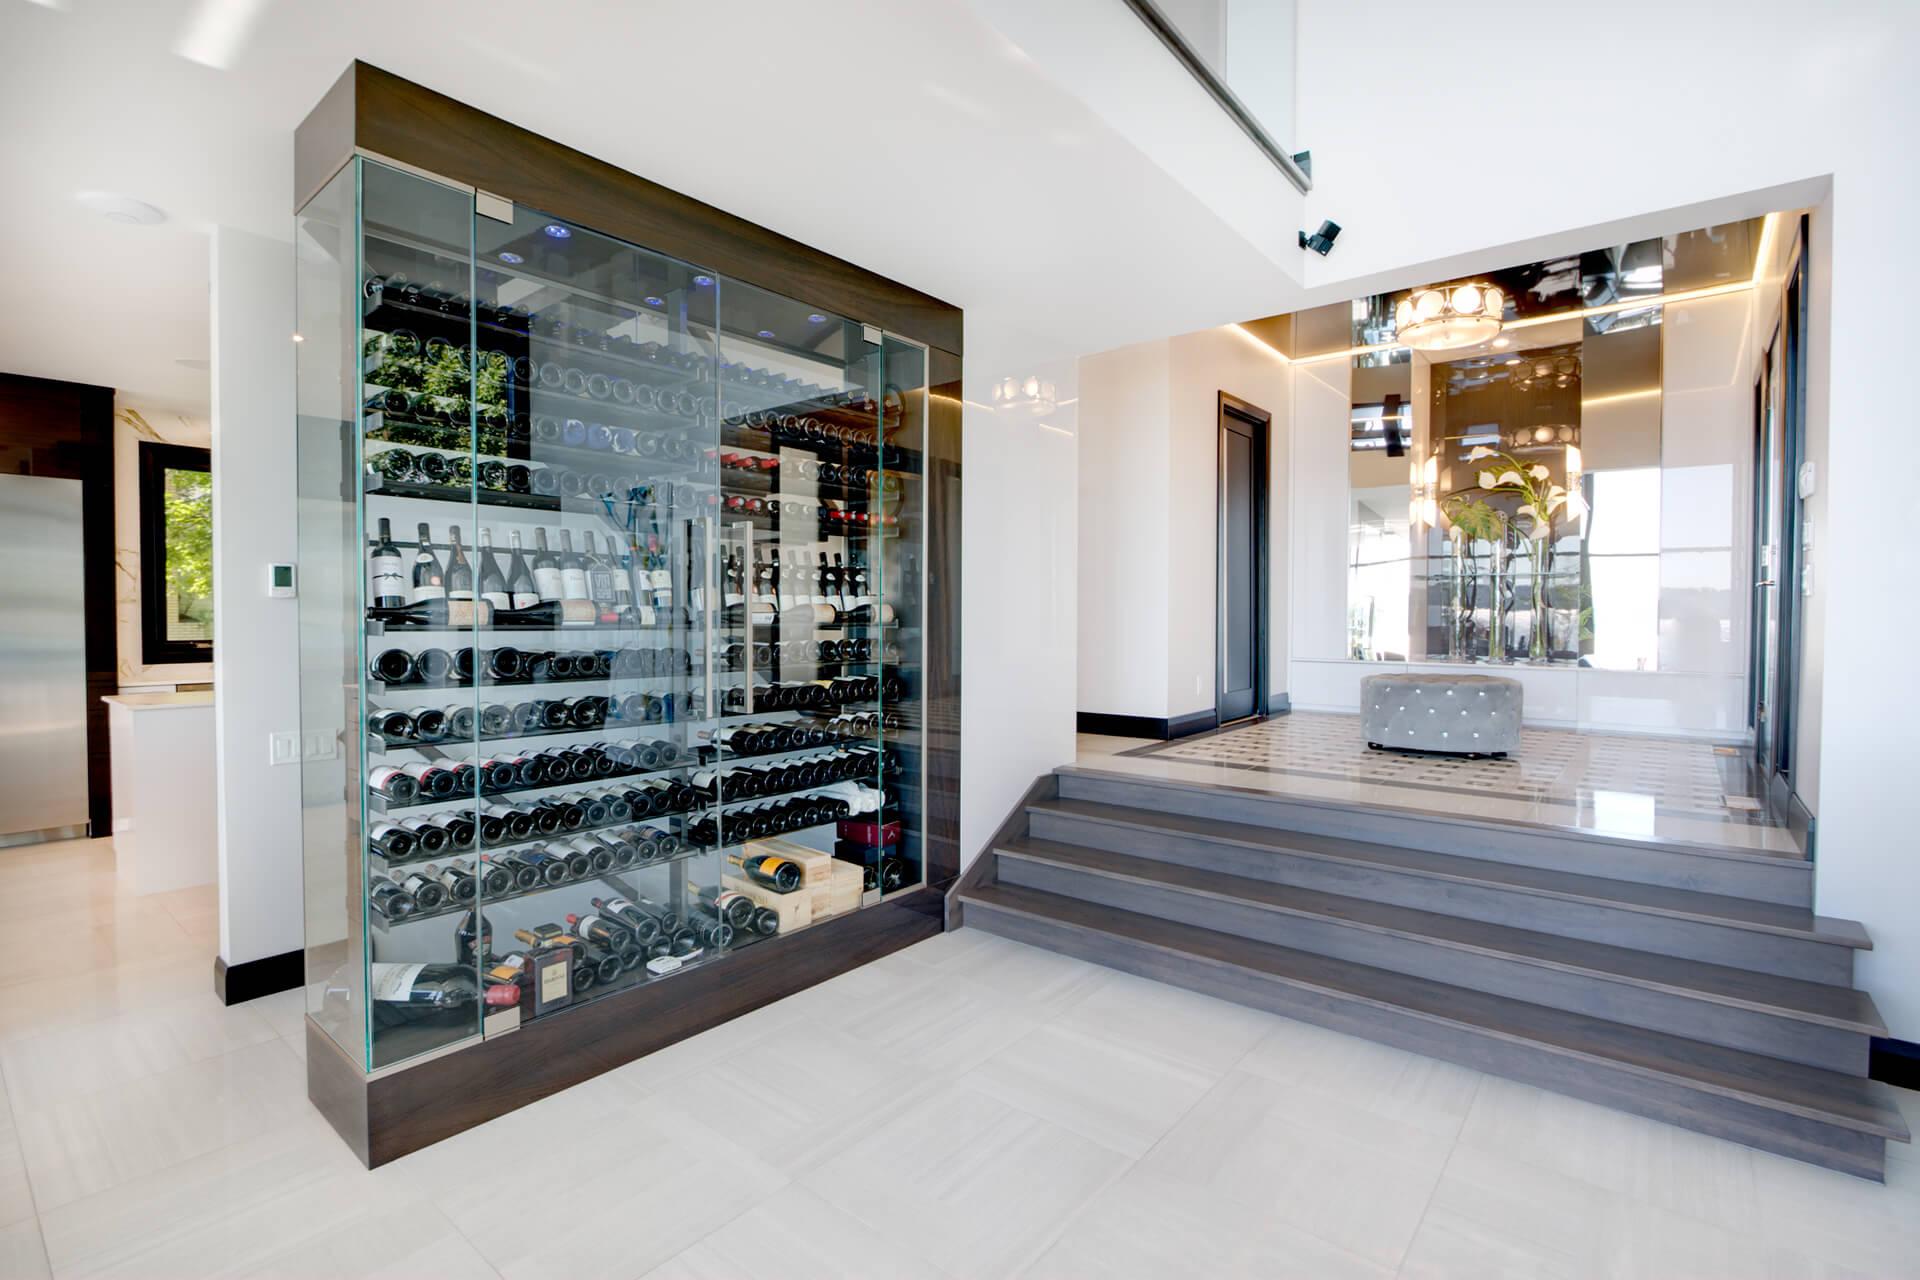 cellier cuisine design amnager une buanderie cellier collection avec amnagement cellier cuisine. Black Bedroom Furniture Sets. Home Design Ideas